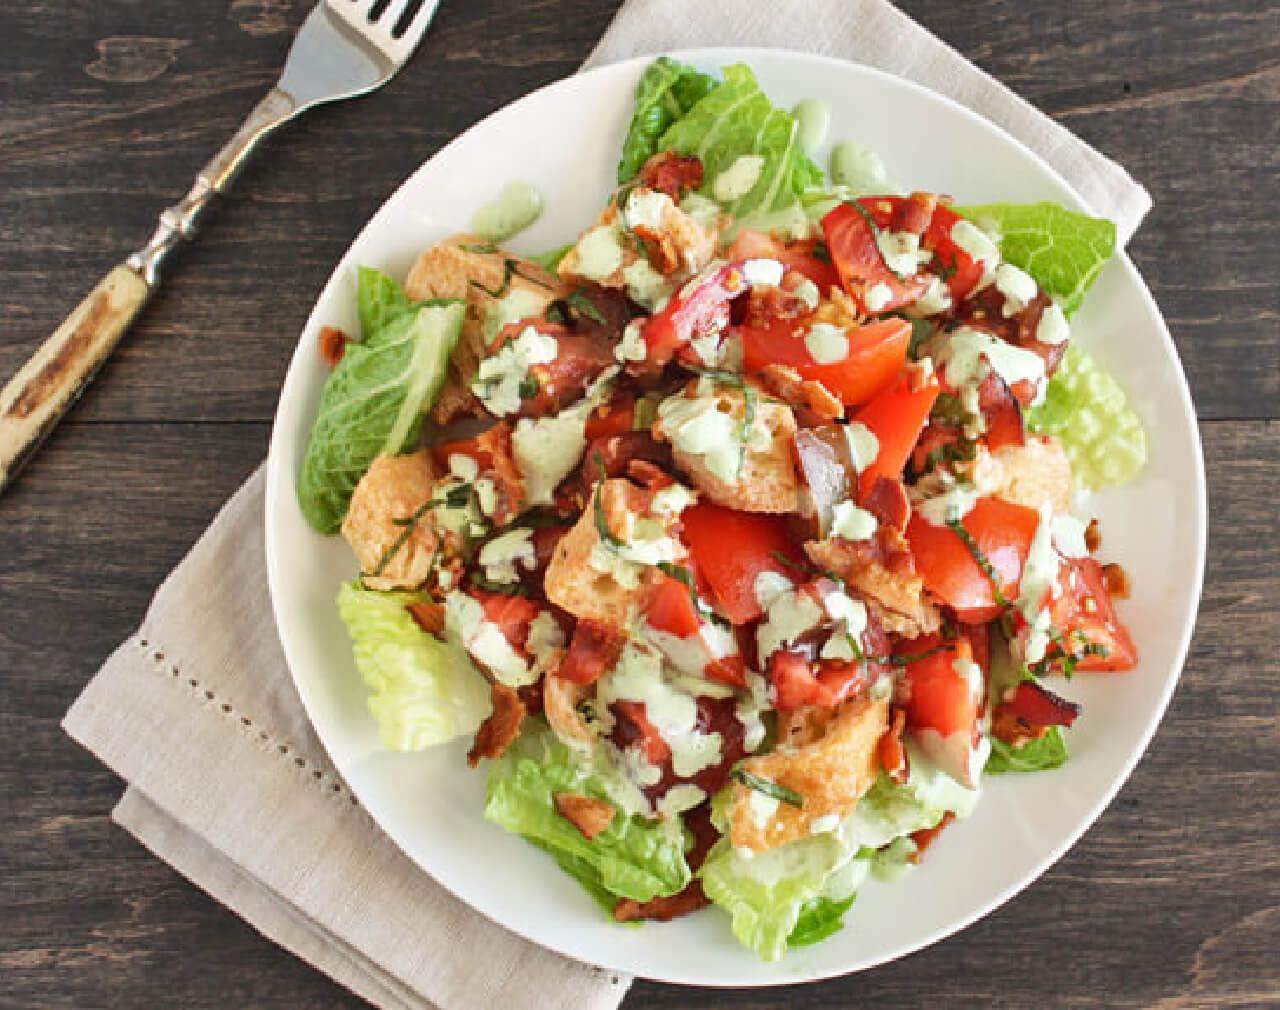 BLT Panzanella Salad with Basil Dressing